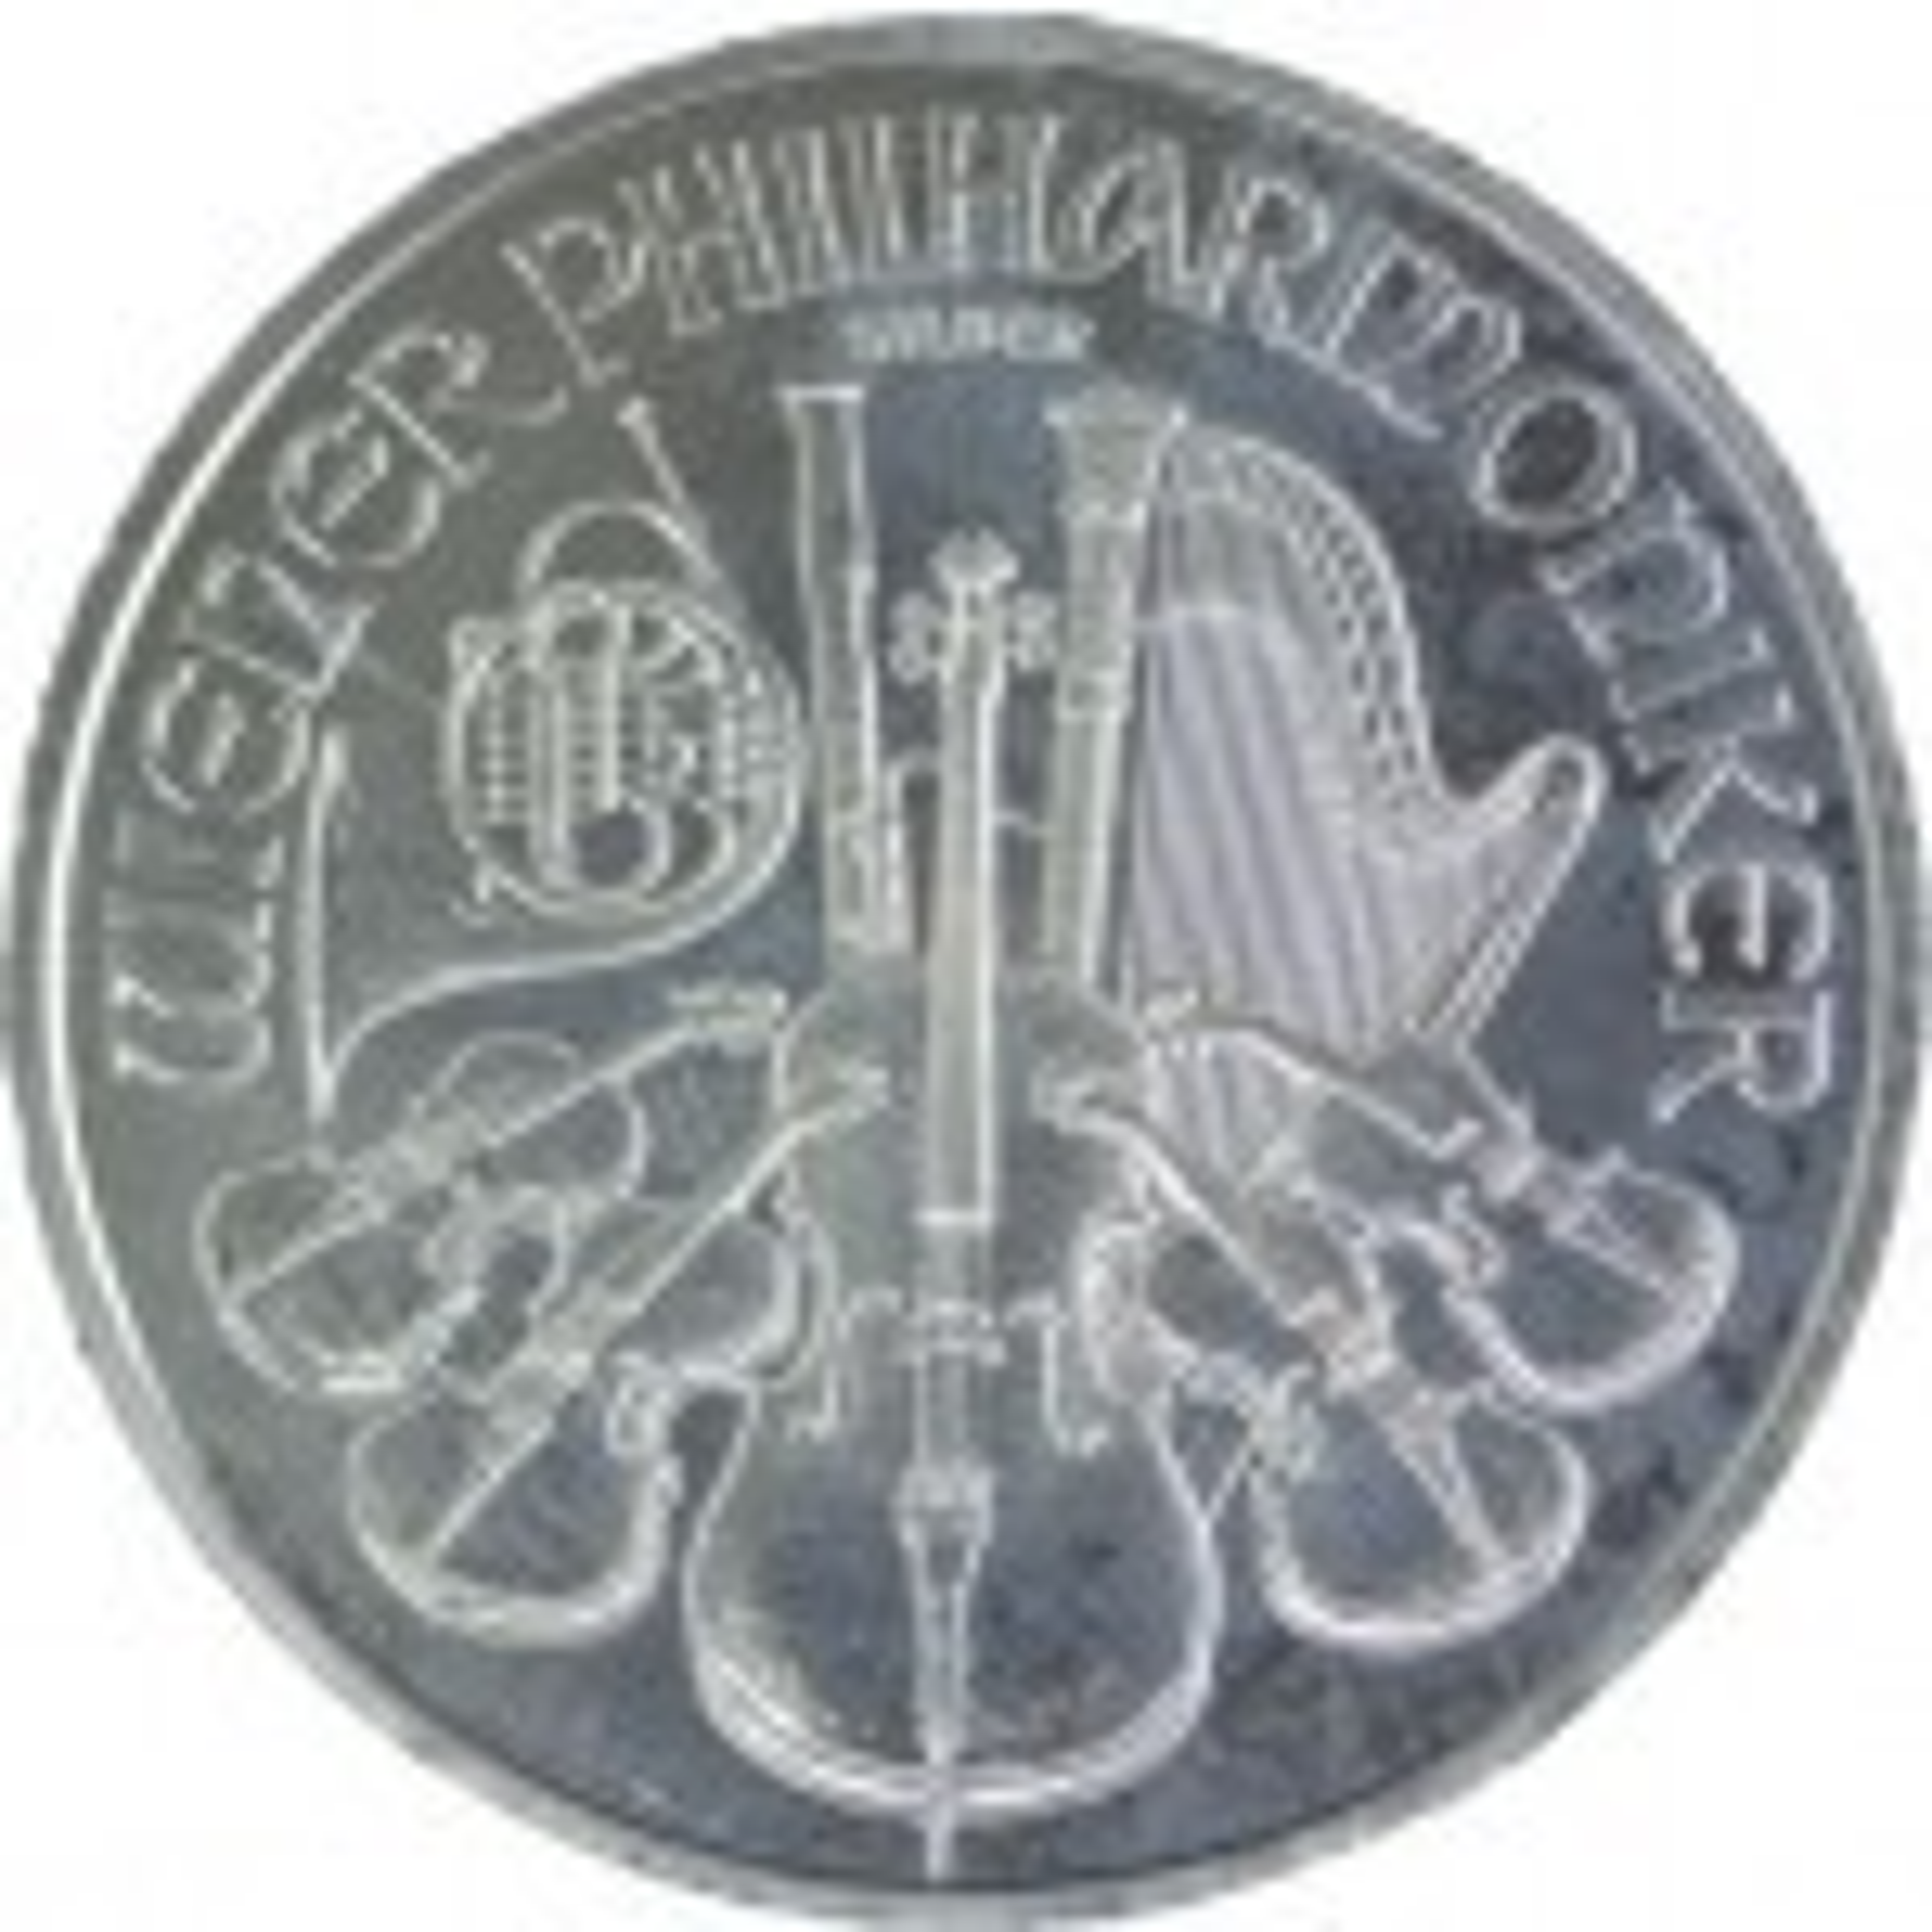 1 Troy ounce silver Philharmonic coin